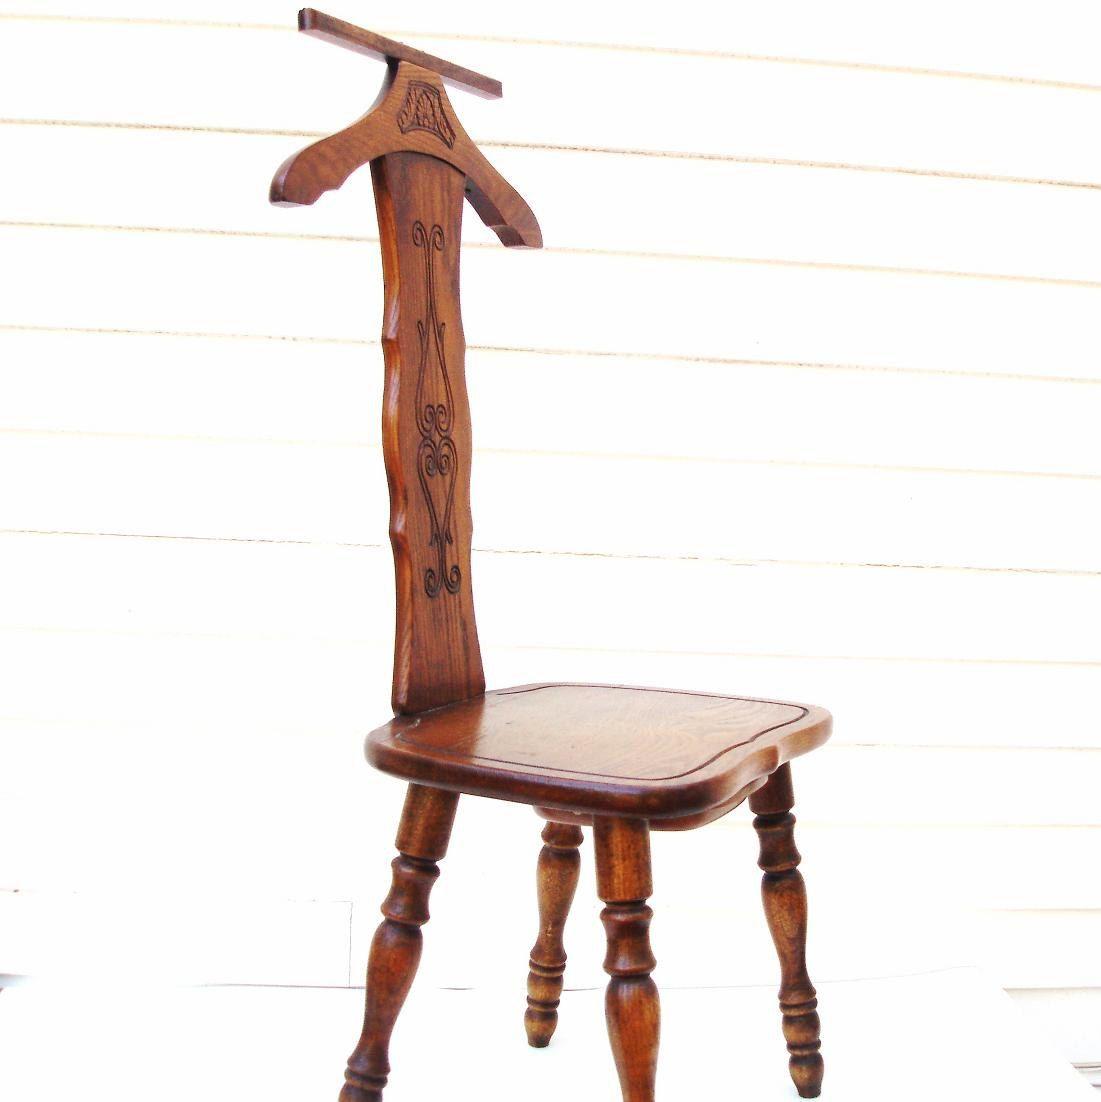 Vintage Wood Butler Chair Wardrobe Stand Wooden Valet Chair Hidden Pocket  Coat Rack by WhimzyThyme on Etsy #woodchair #valet #butler - Vintage Wood Butler Chair Wardrobe Stand Wooden Valet Chair Hidden